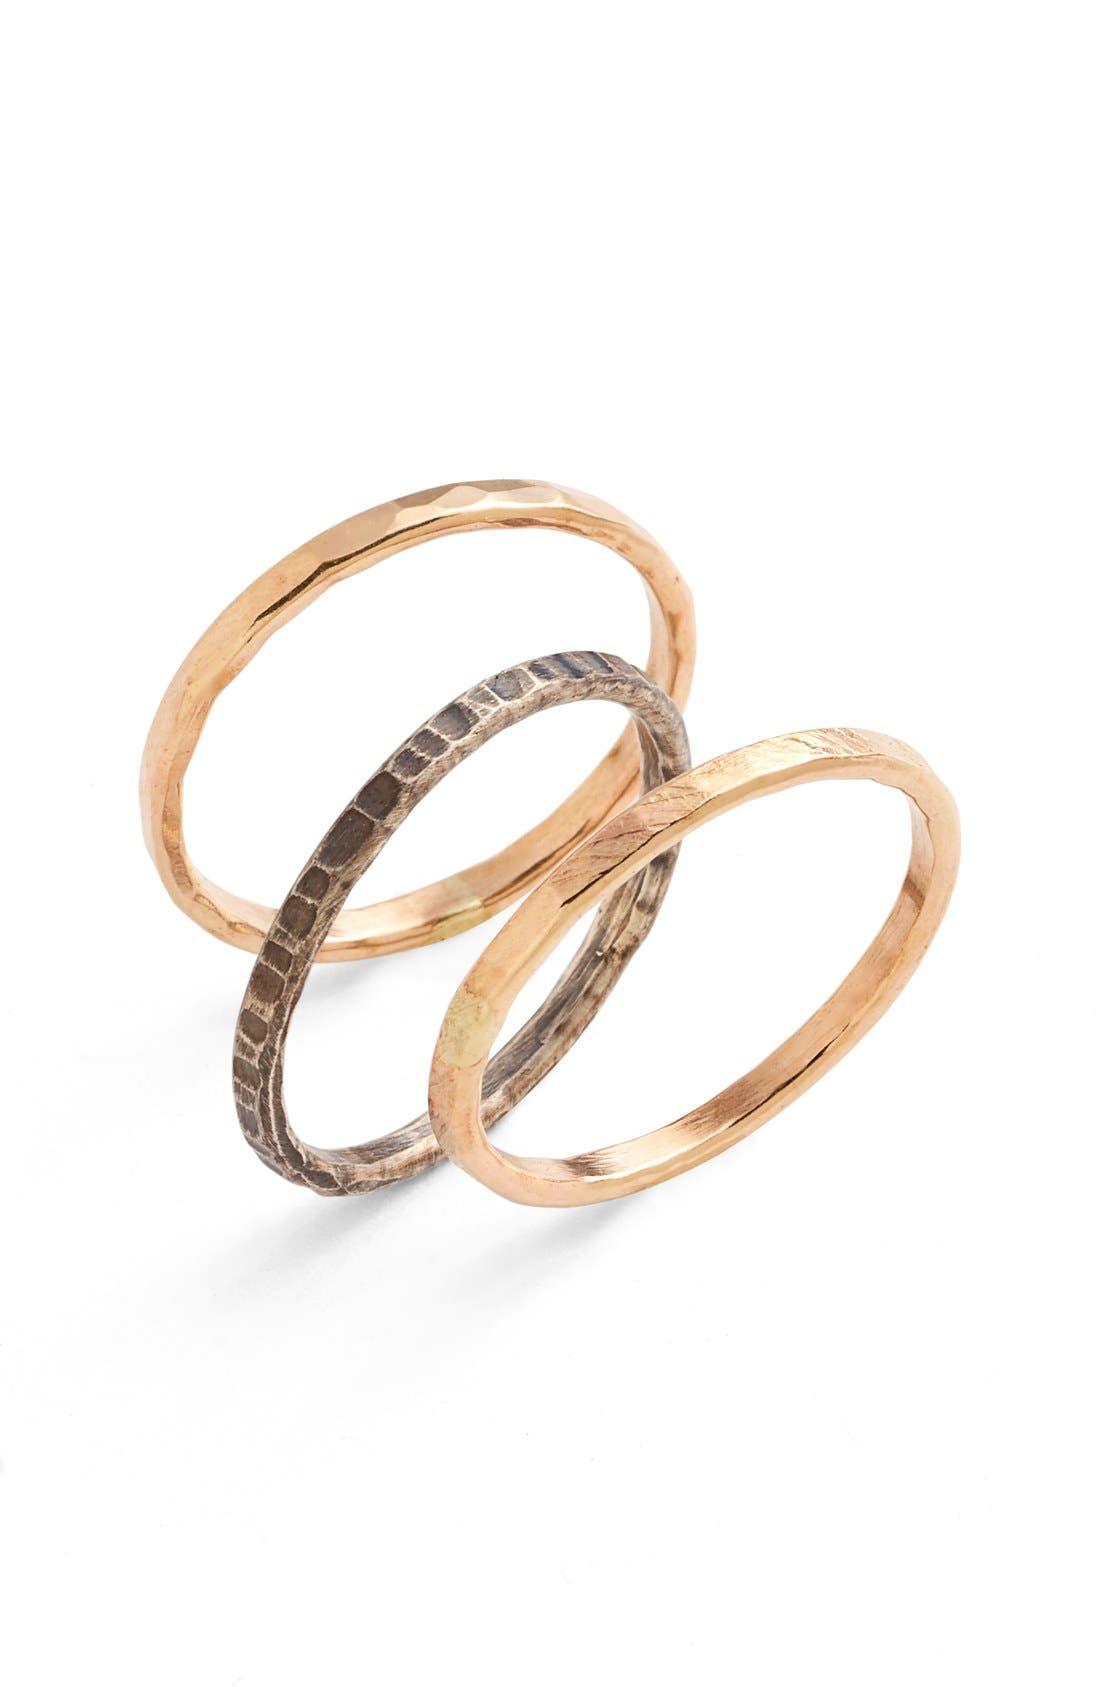 Nashelle Ija Stackable Hammered Rings (Set of 3)